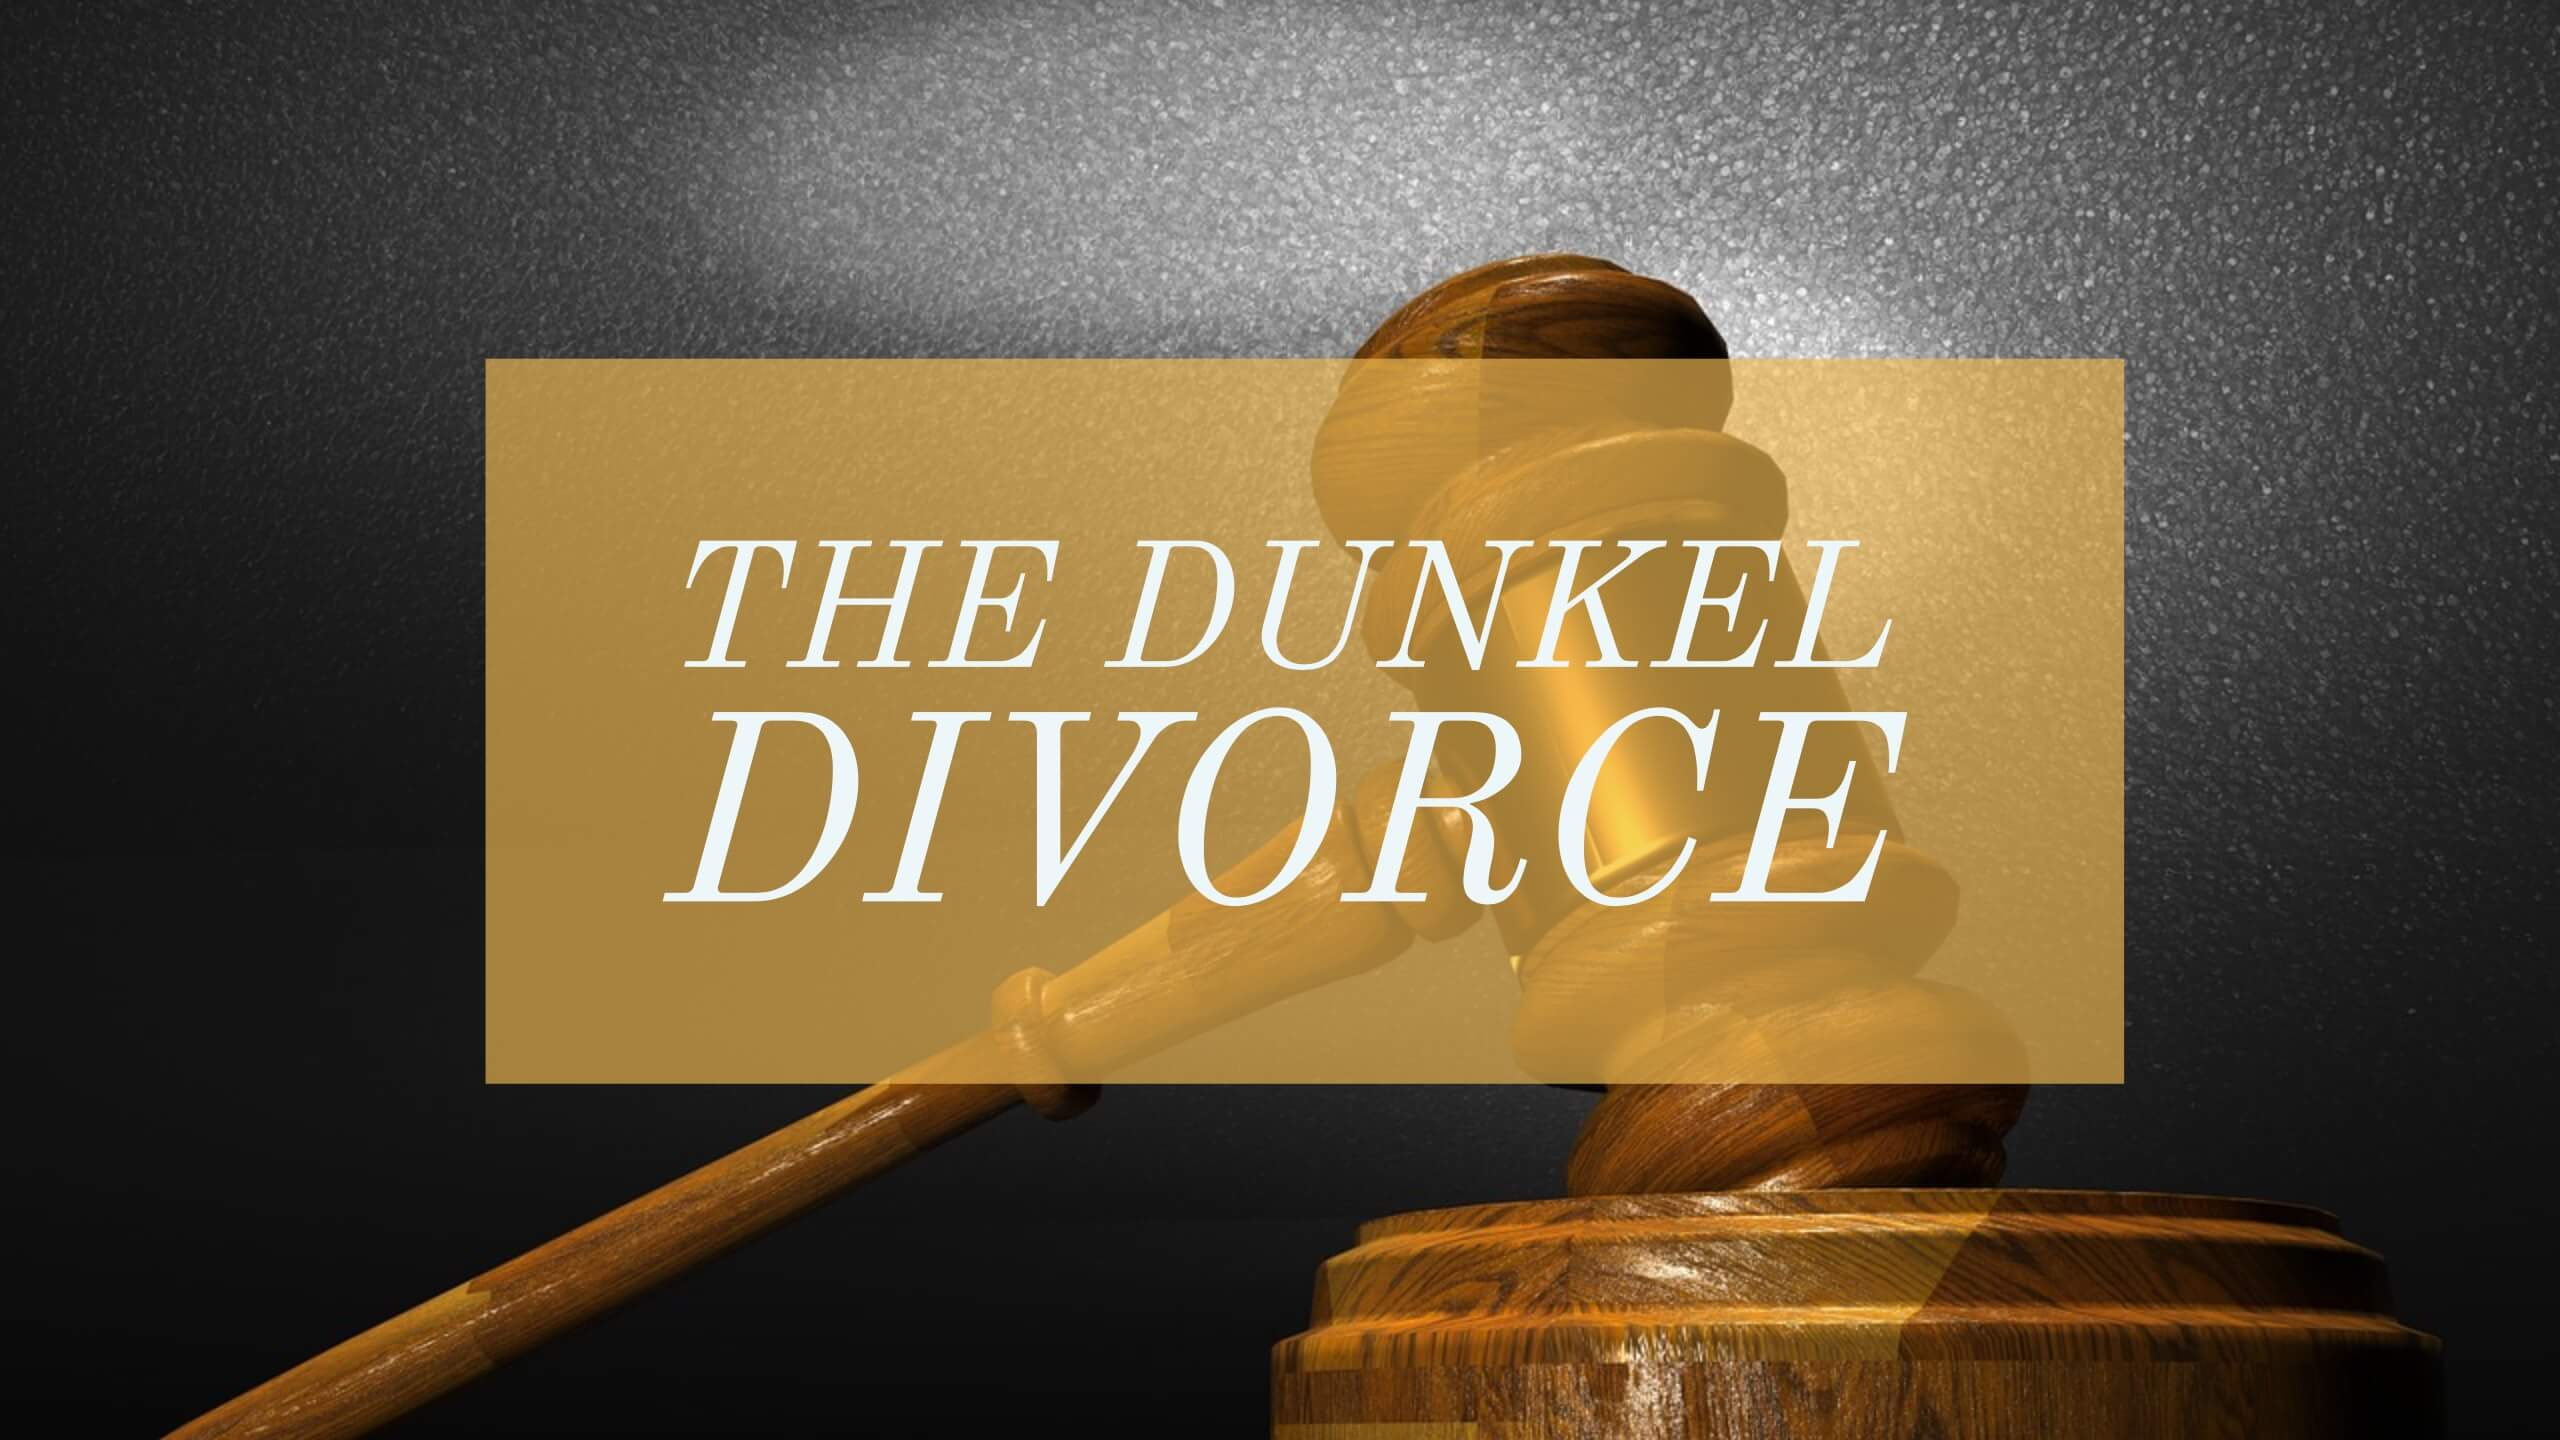 The Dunkel Divorce